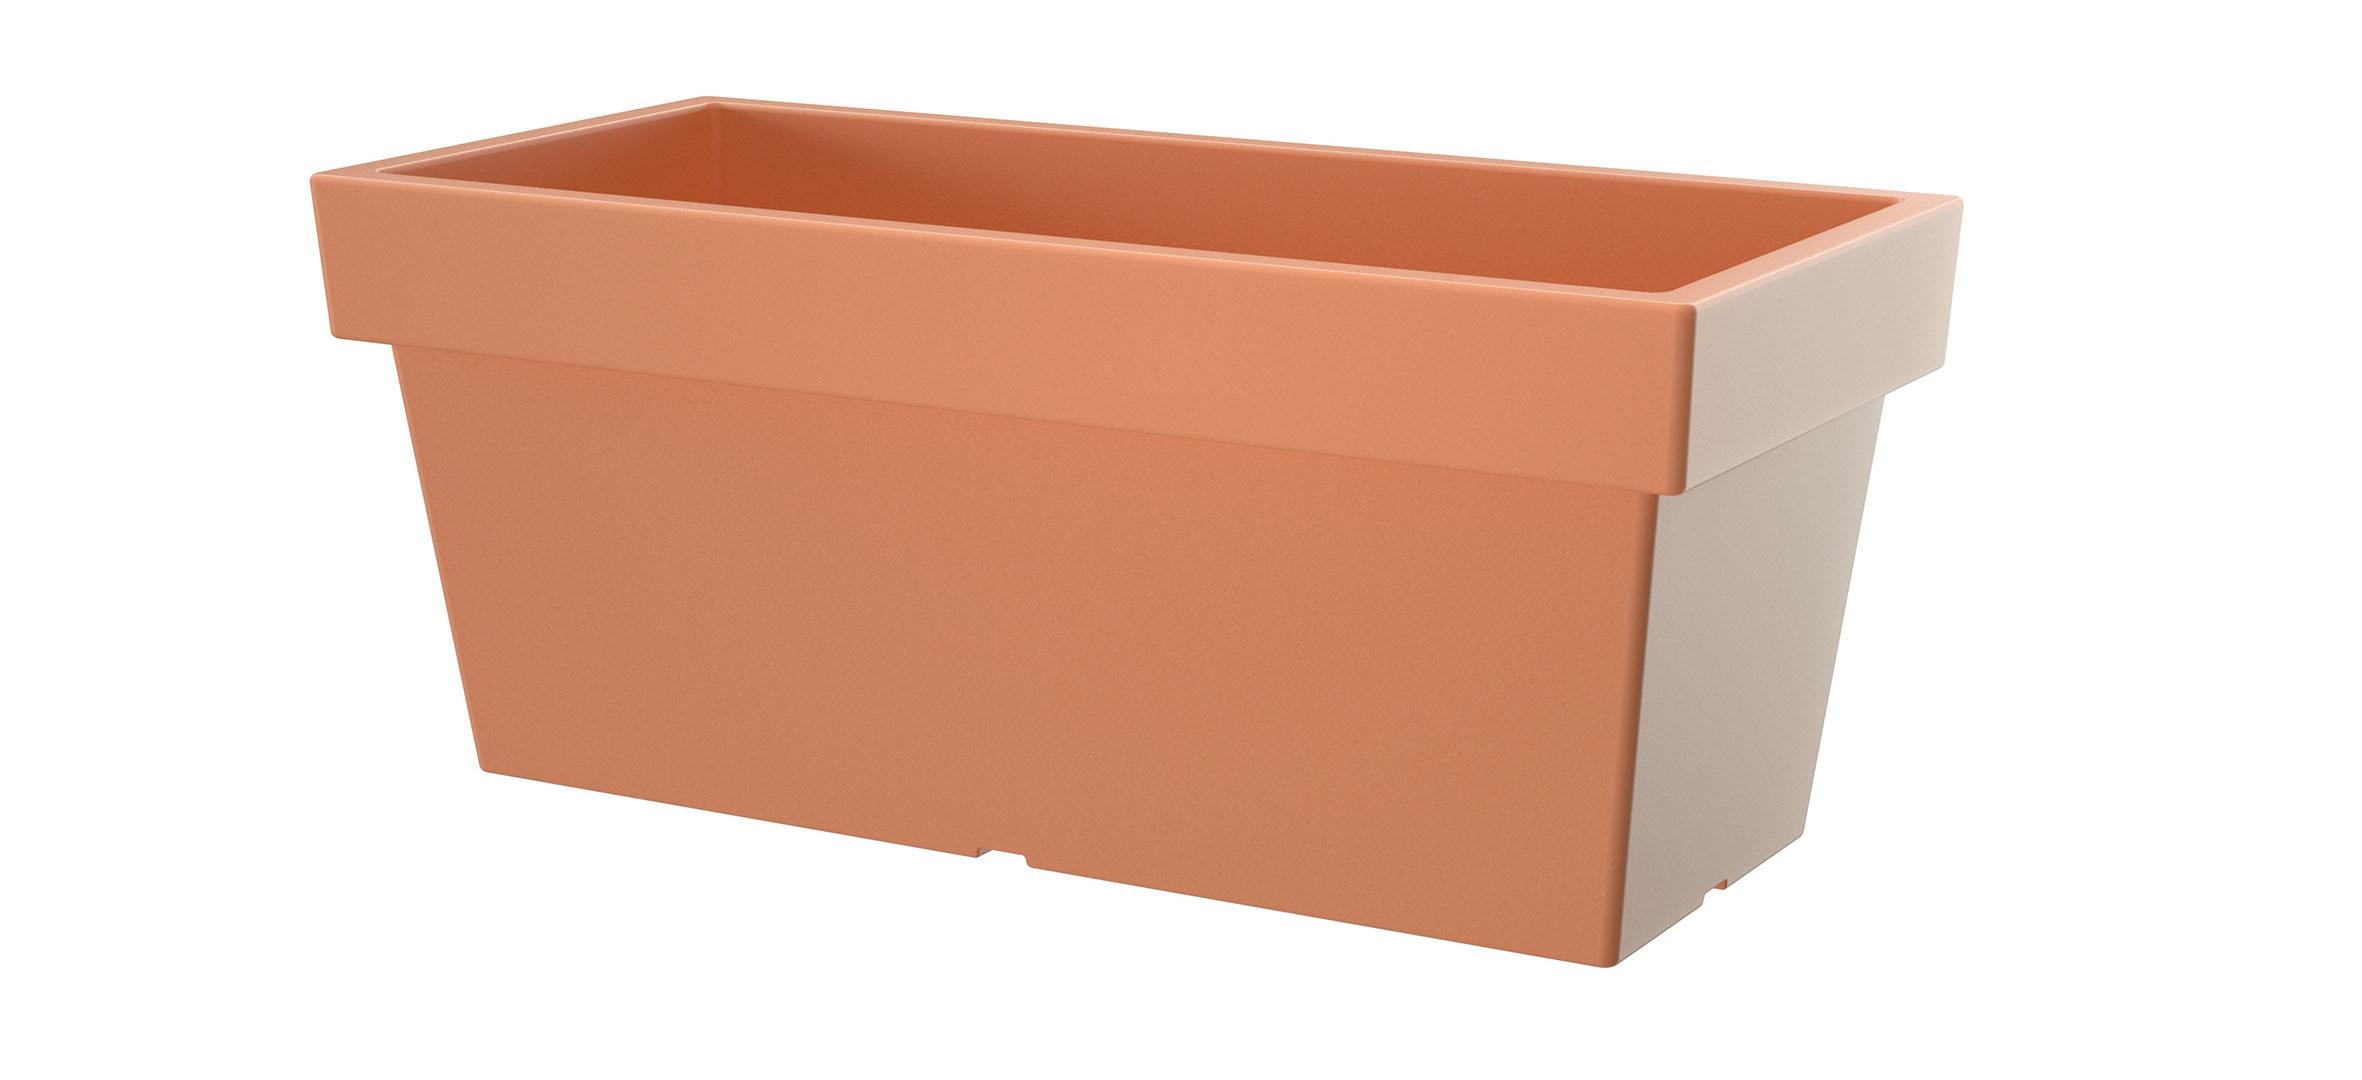 PROSPERPLAST Truhlík LOFLY CASE terakota 57,8cm